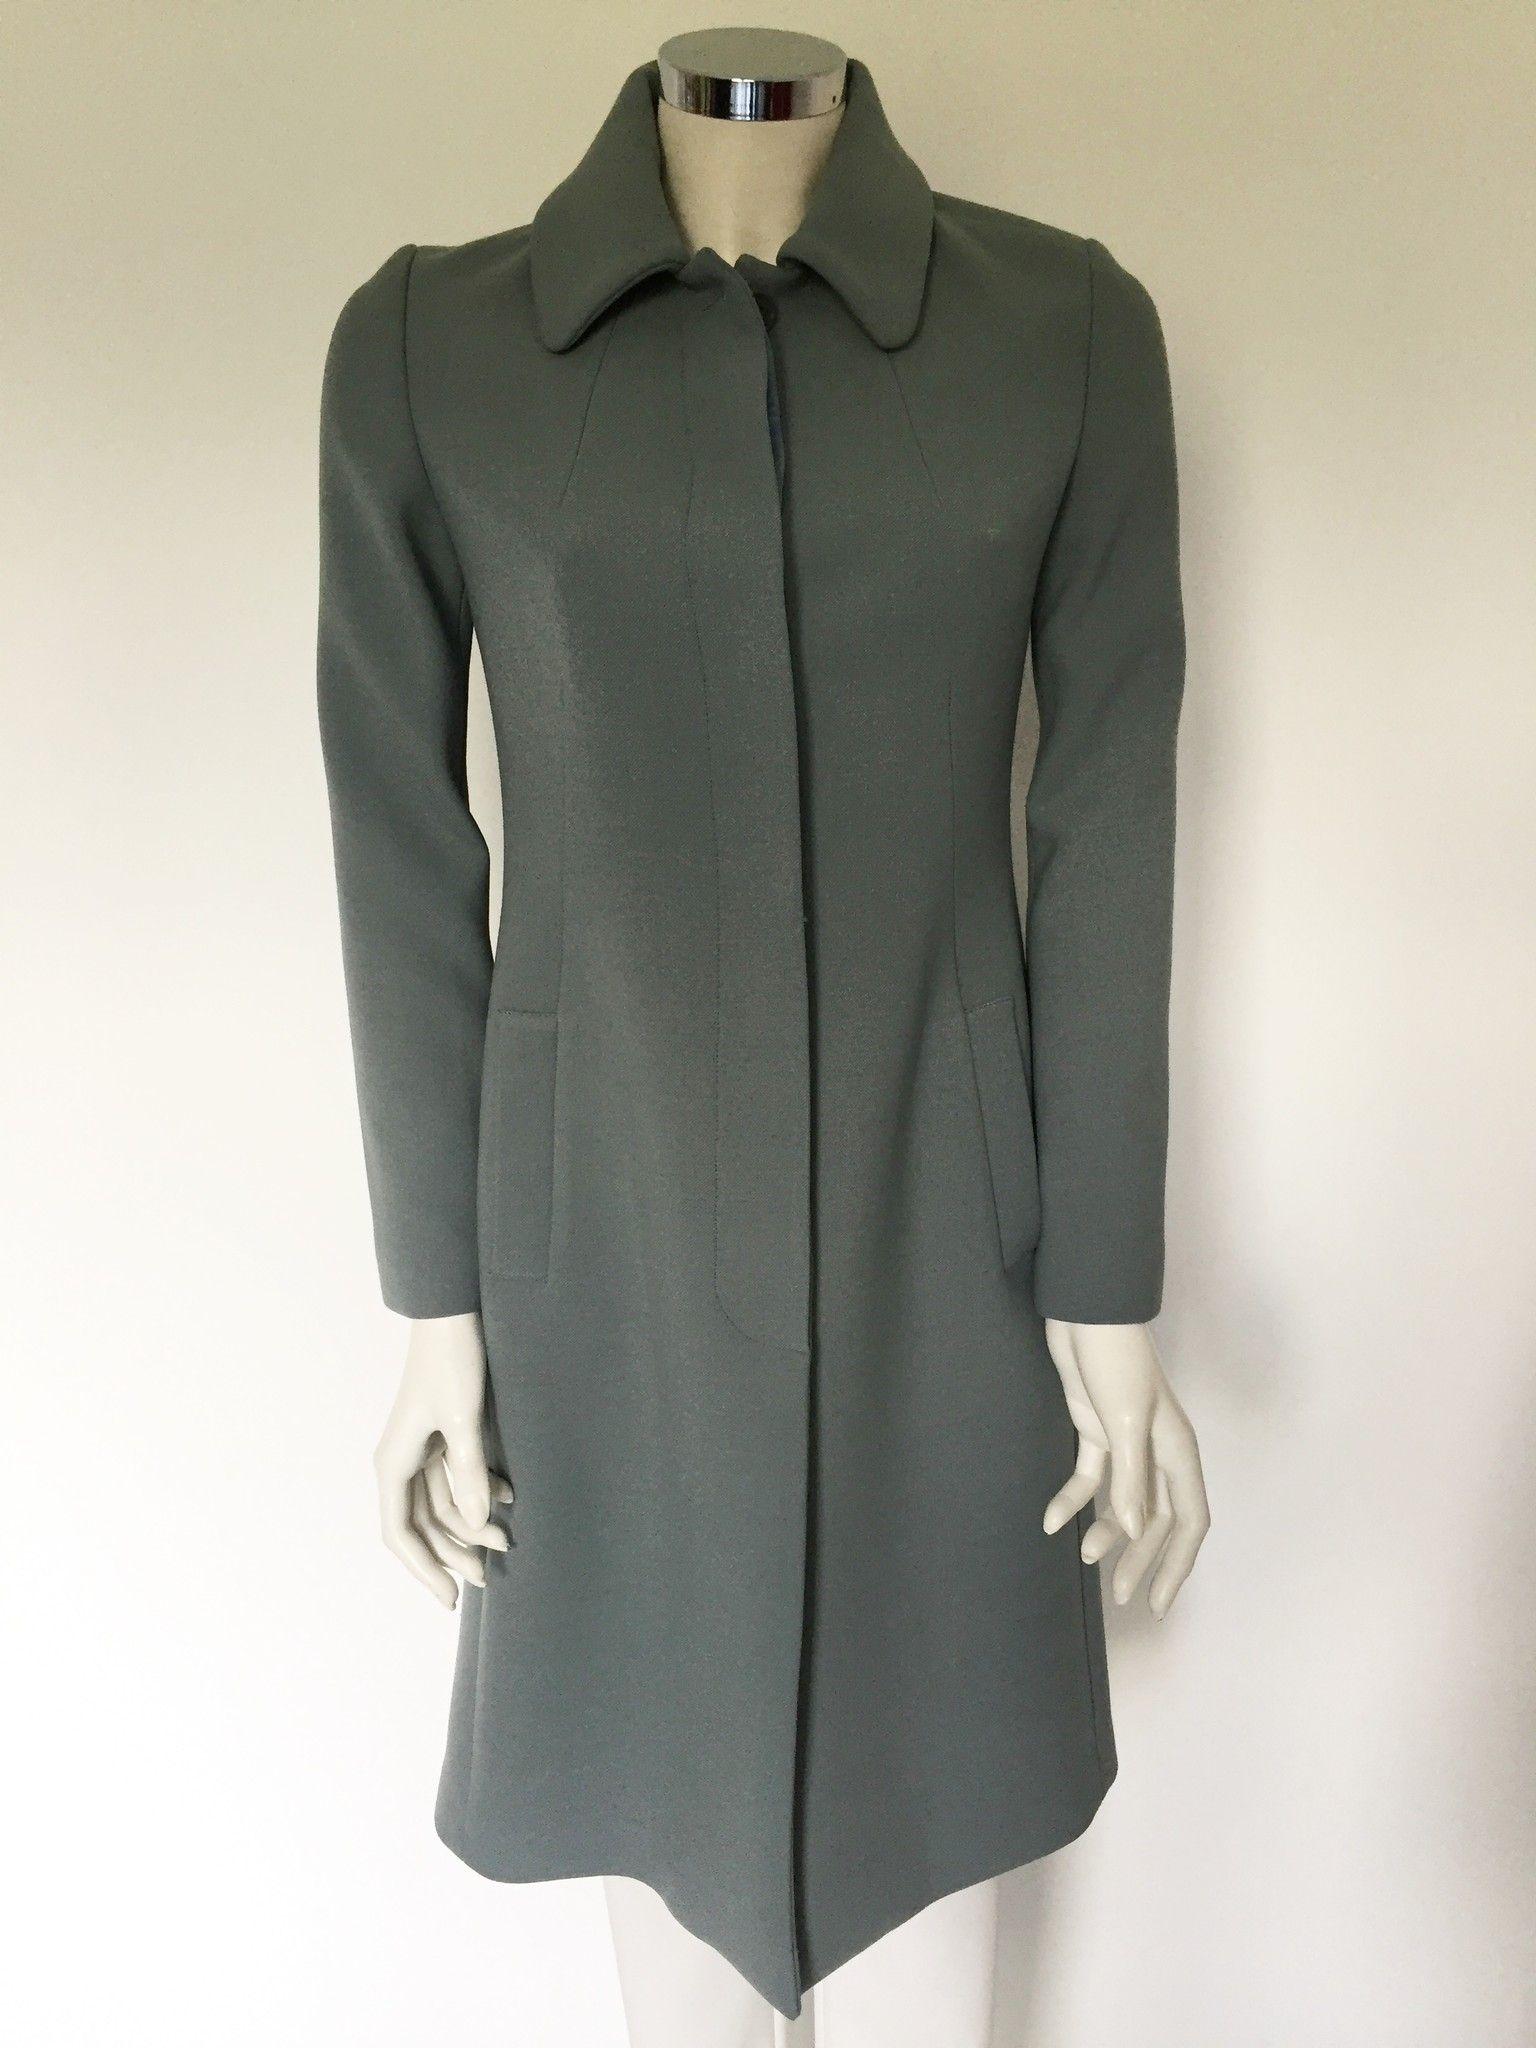 Adele Fado Slimfit Overcoat Cod.CP103